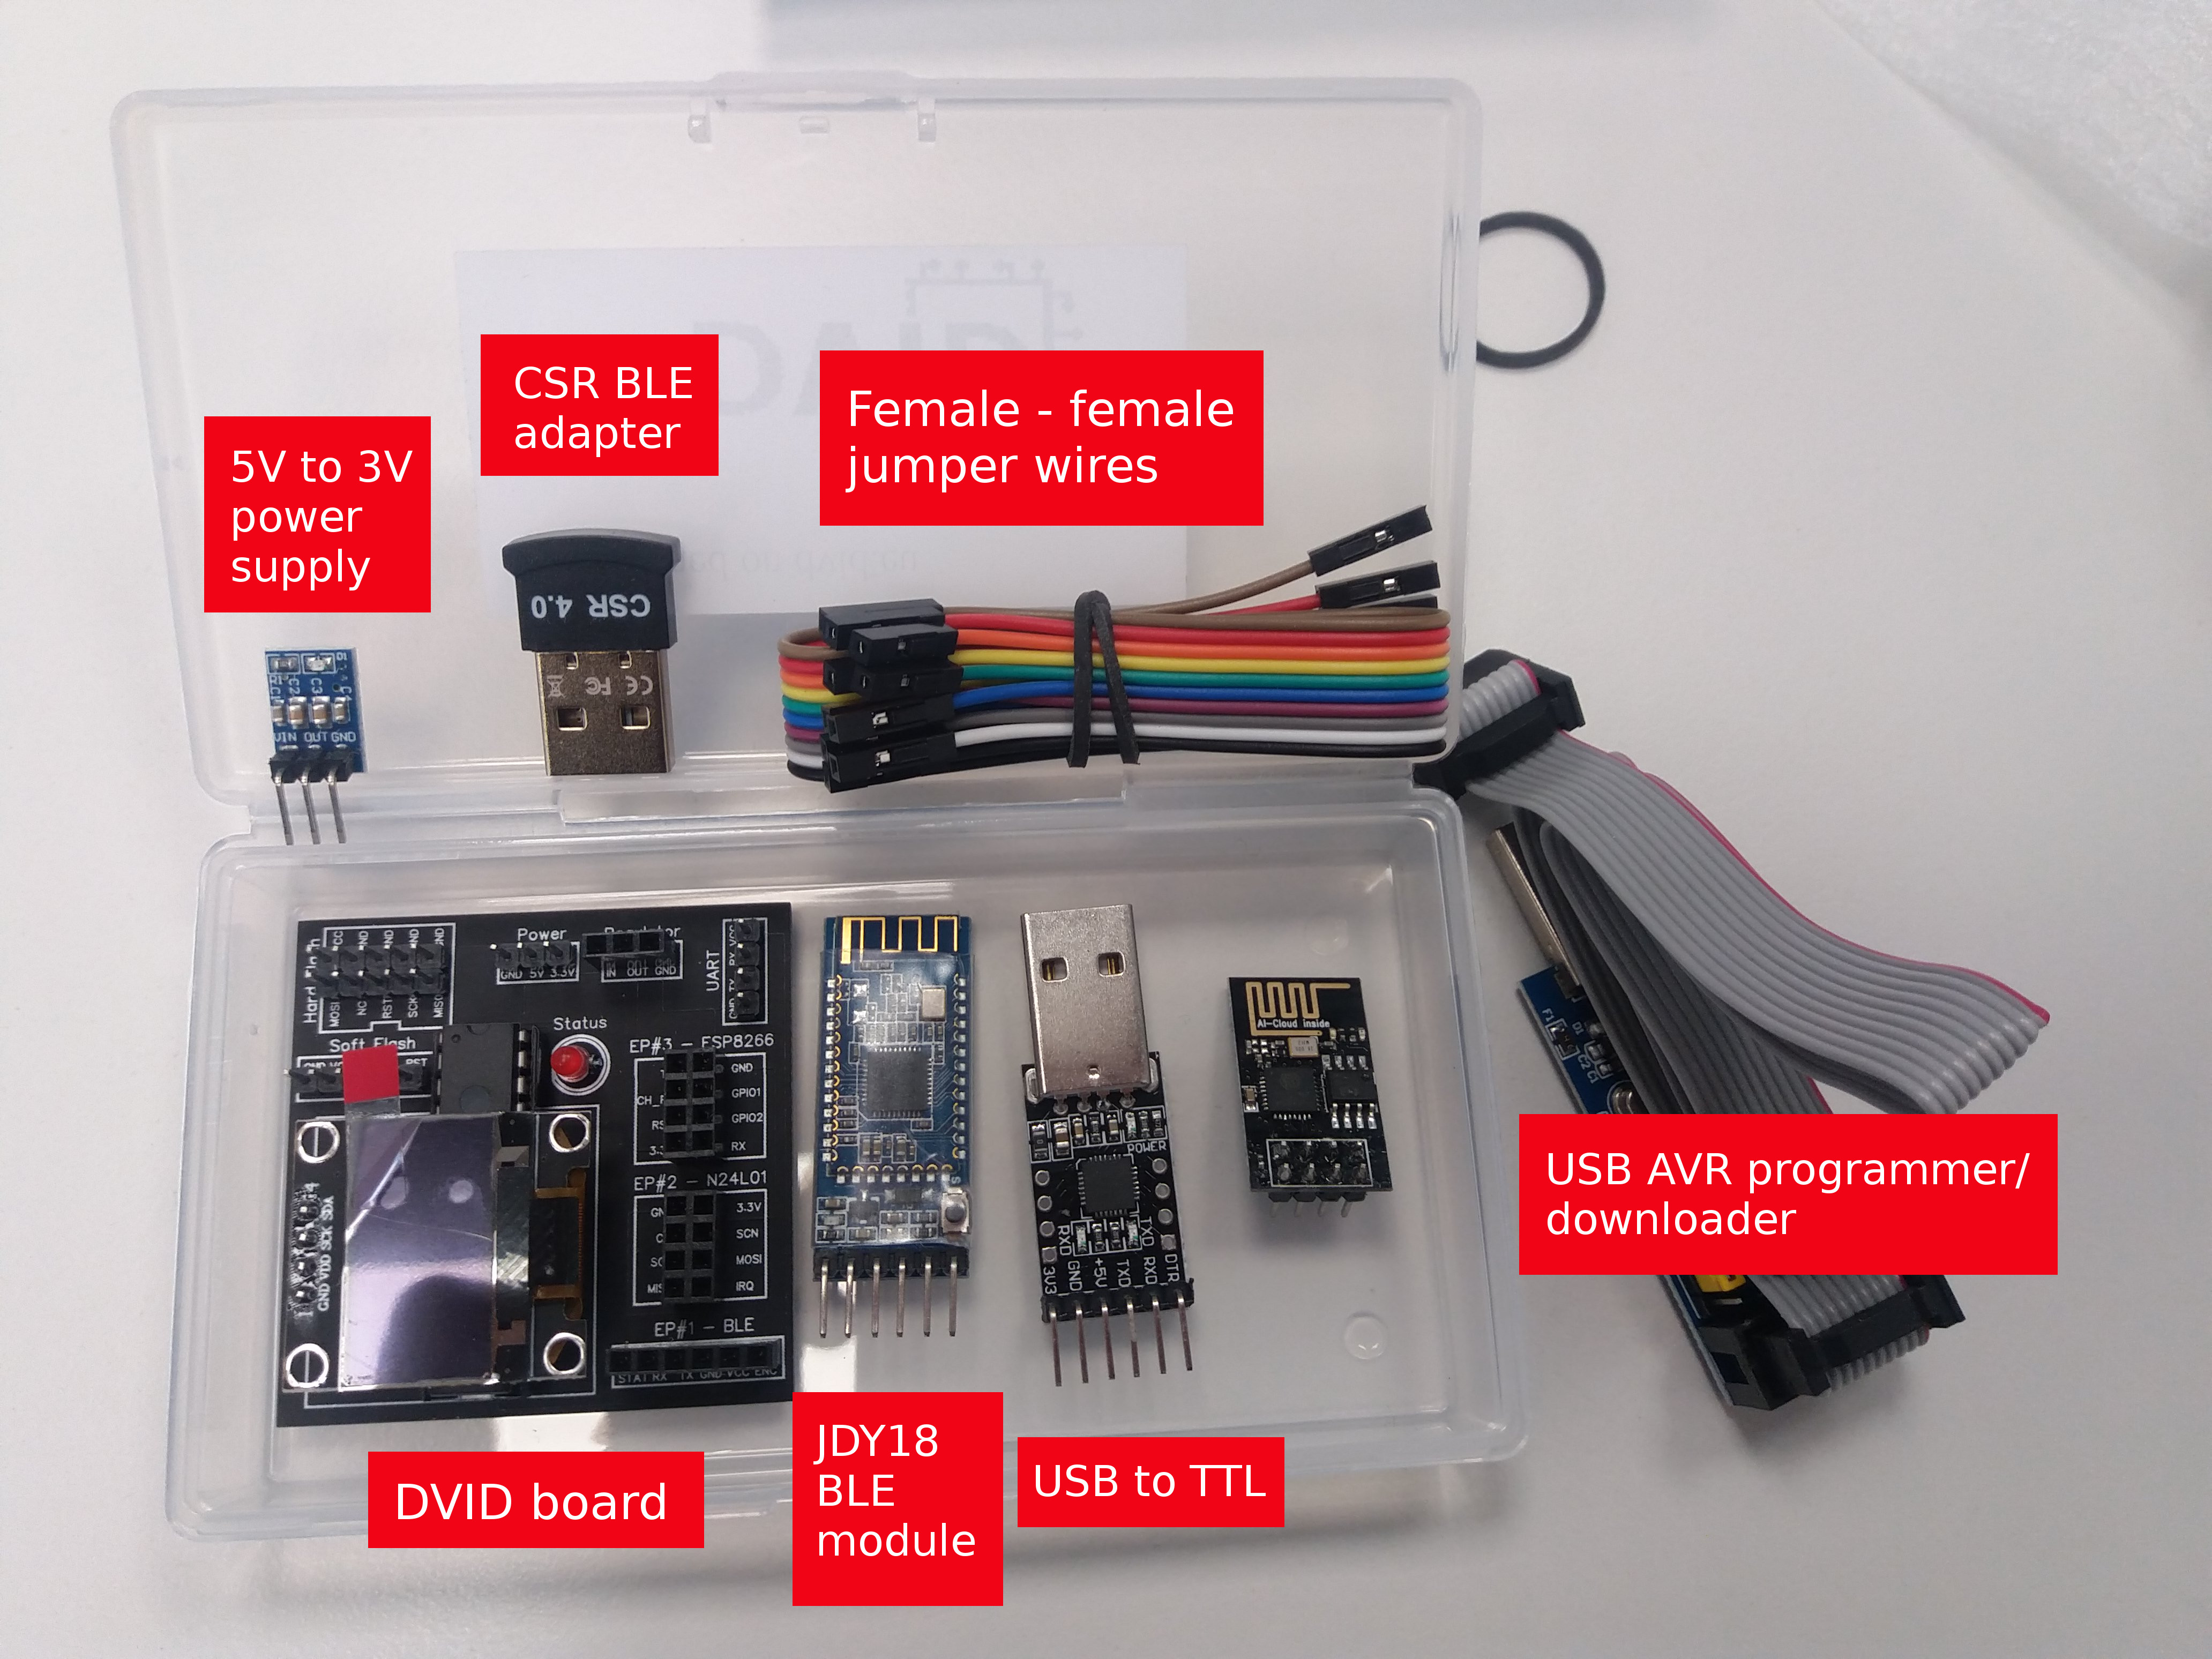 https://raw.githubusercontent.com/Vulcainreo/DVID/master/kit-contents.jpg